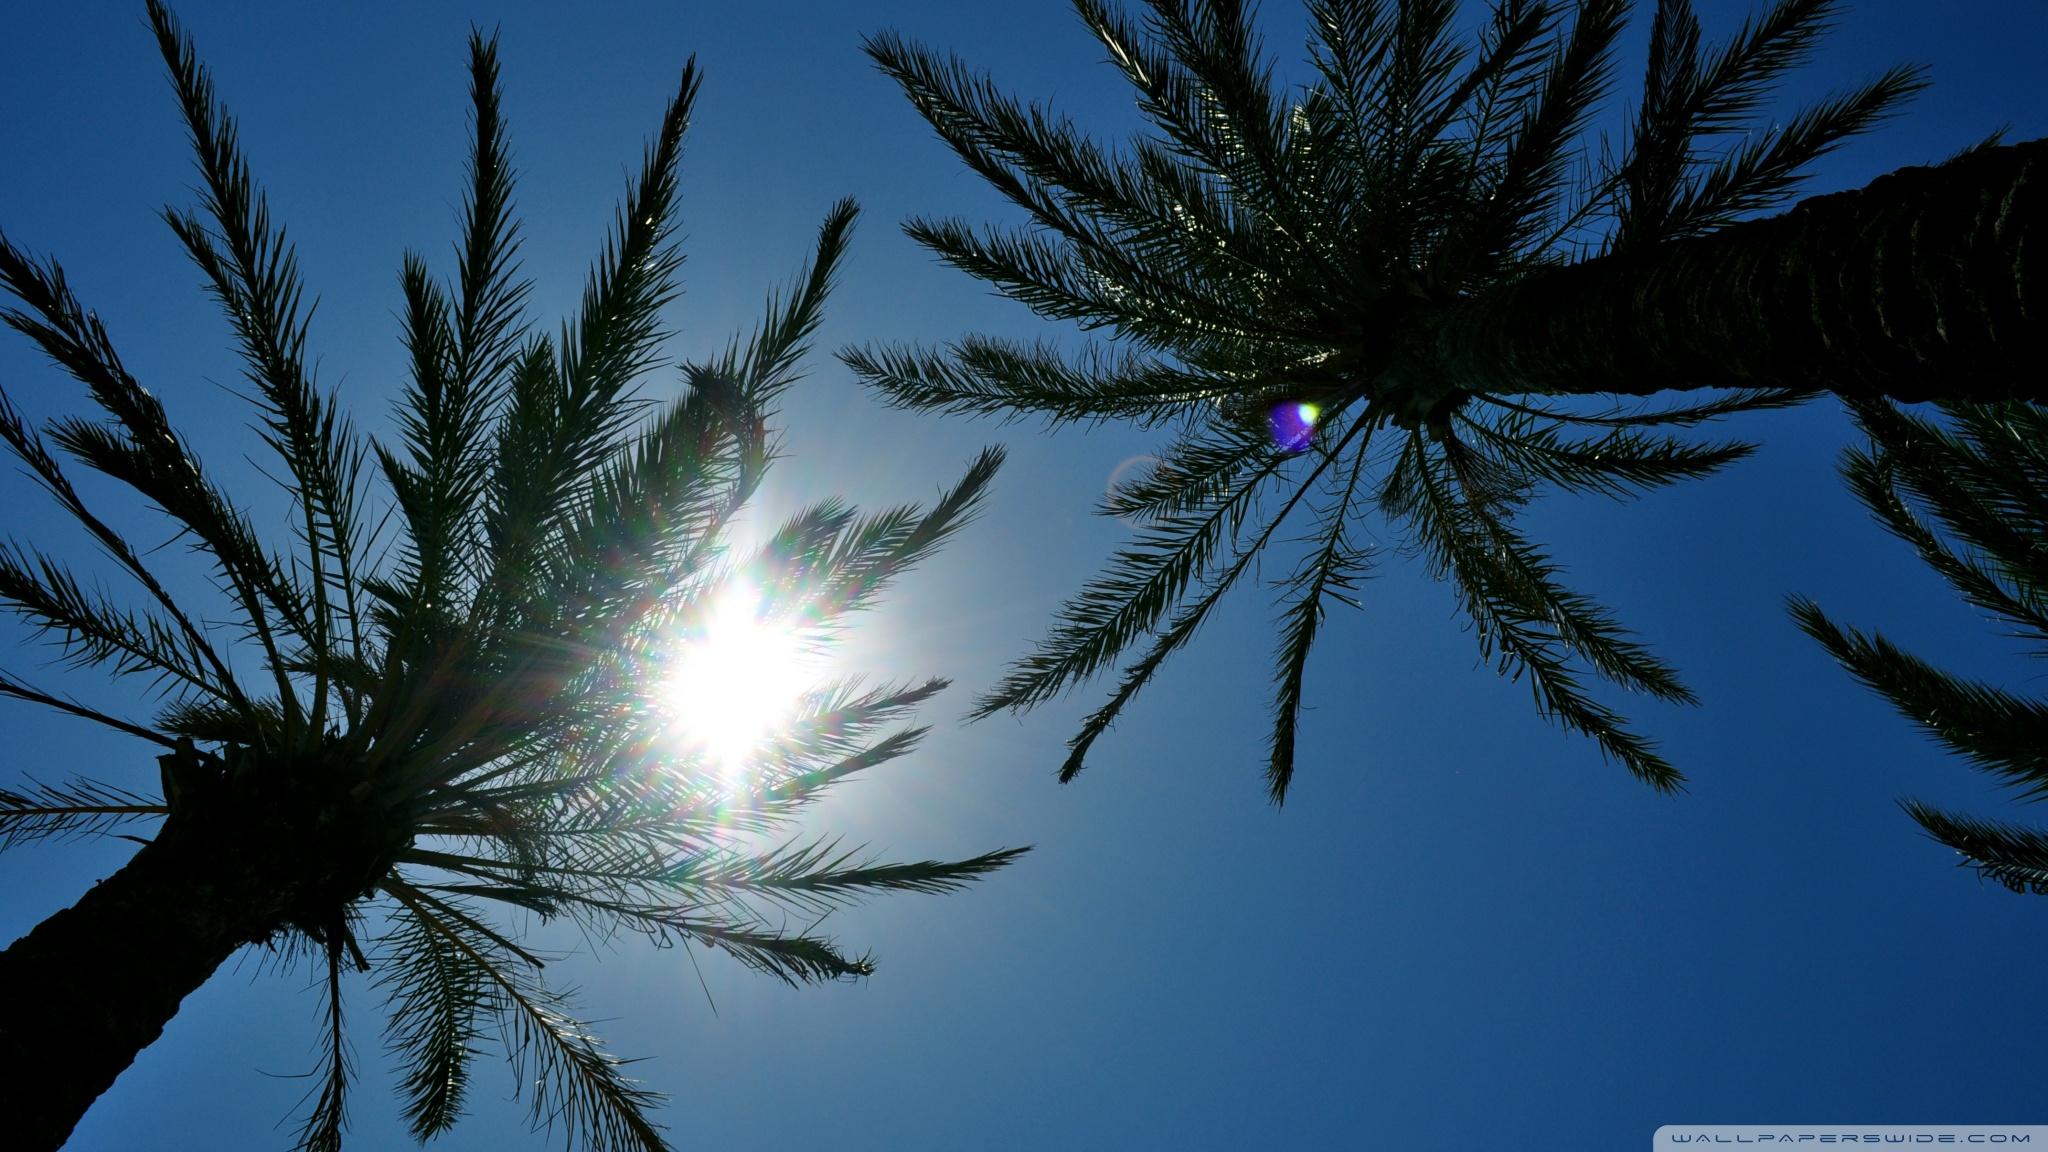 Cute Palm Tree Wallpaper Sunlight Through Palm Trees 4k Hd Desktop Wallpaper For 4k